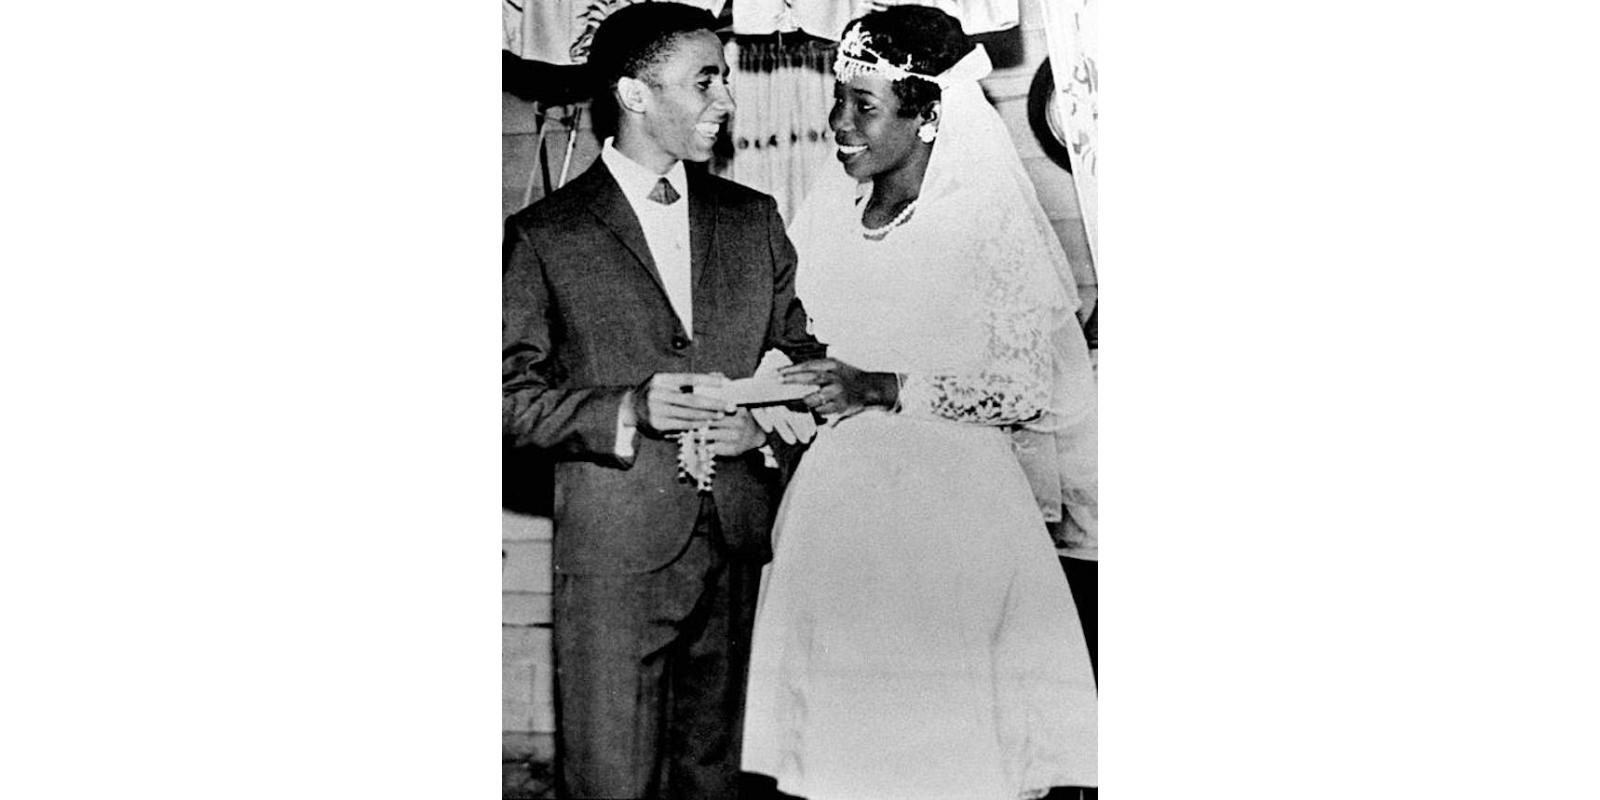 Mariage de Bob et Rita Marley